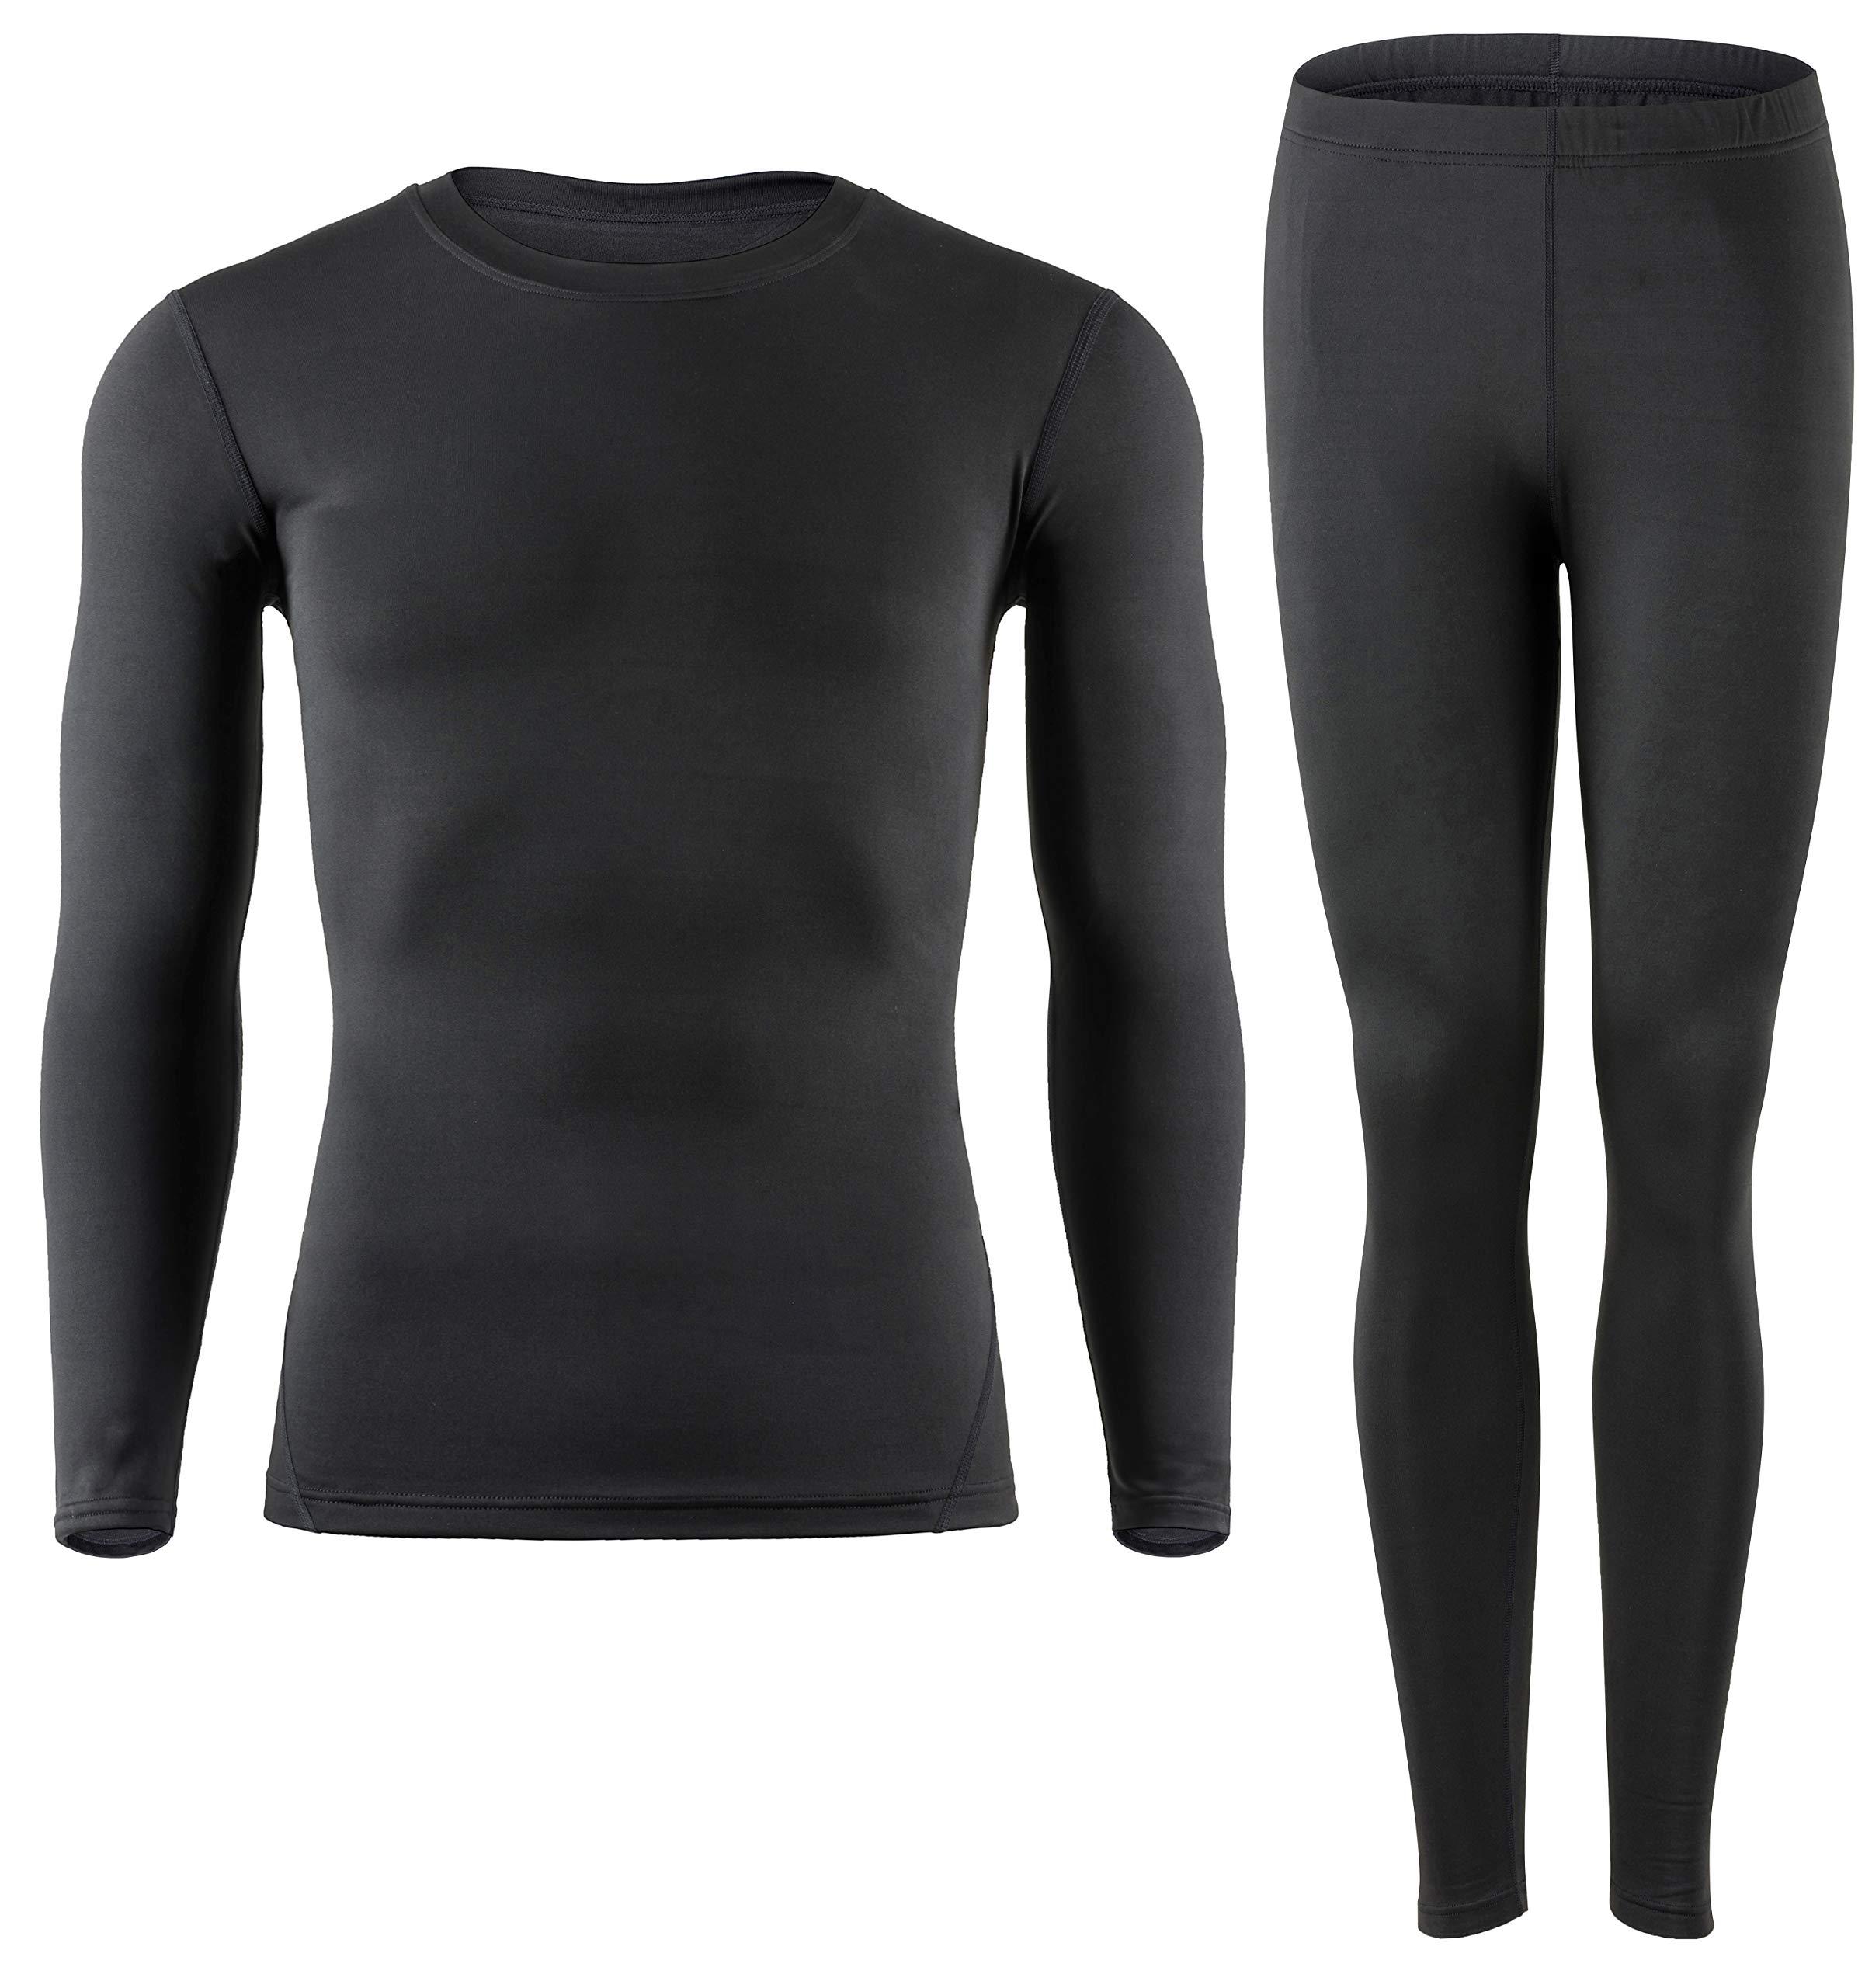 MOLLDAN Men's Thermal Underwear Baselayer Long Johns Tops & Bottom Set with Fleece Lined(L,Black) by MOLLDAN